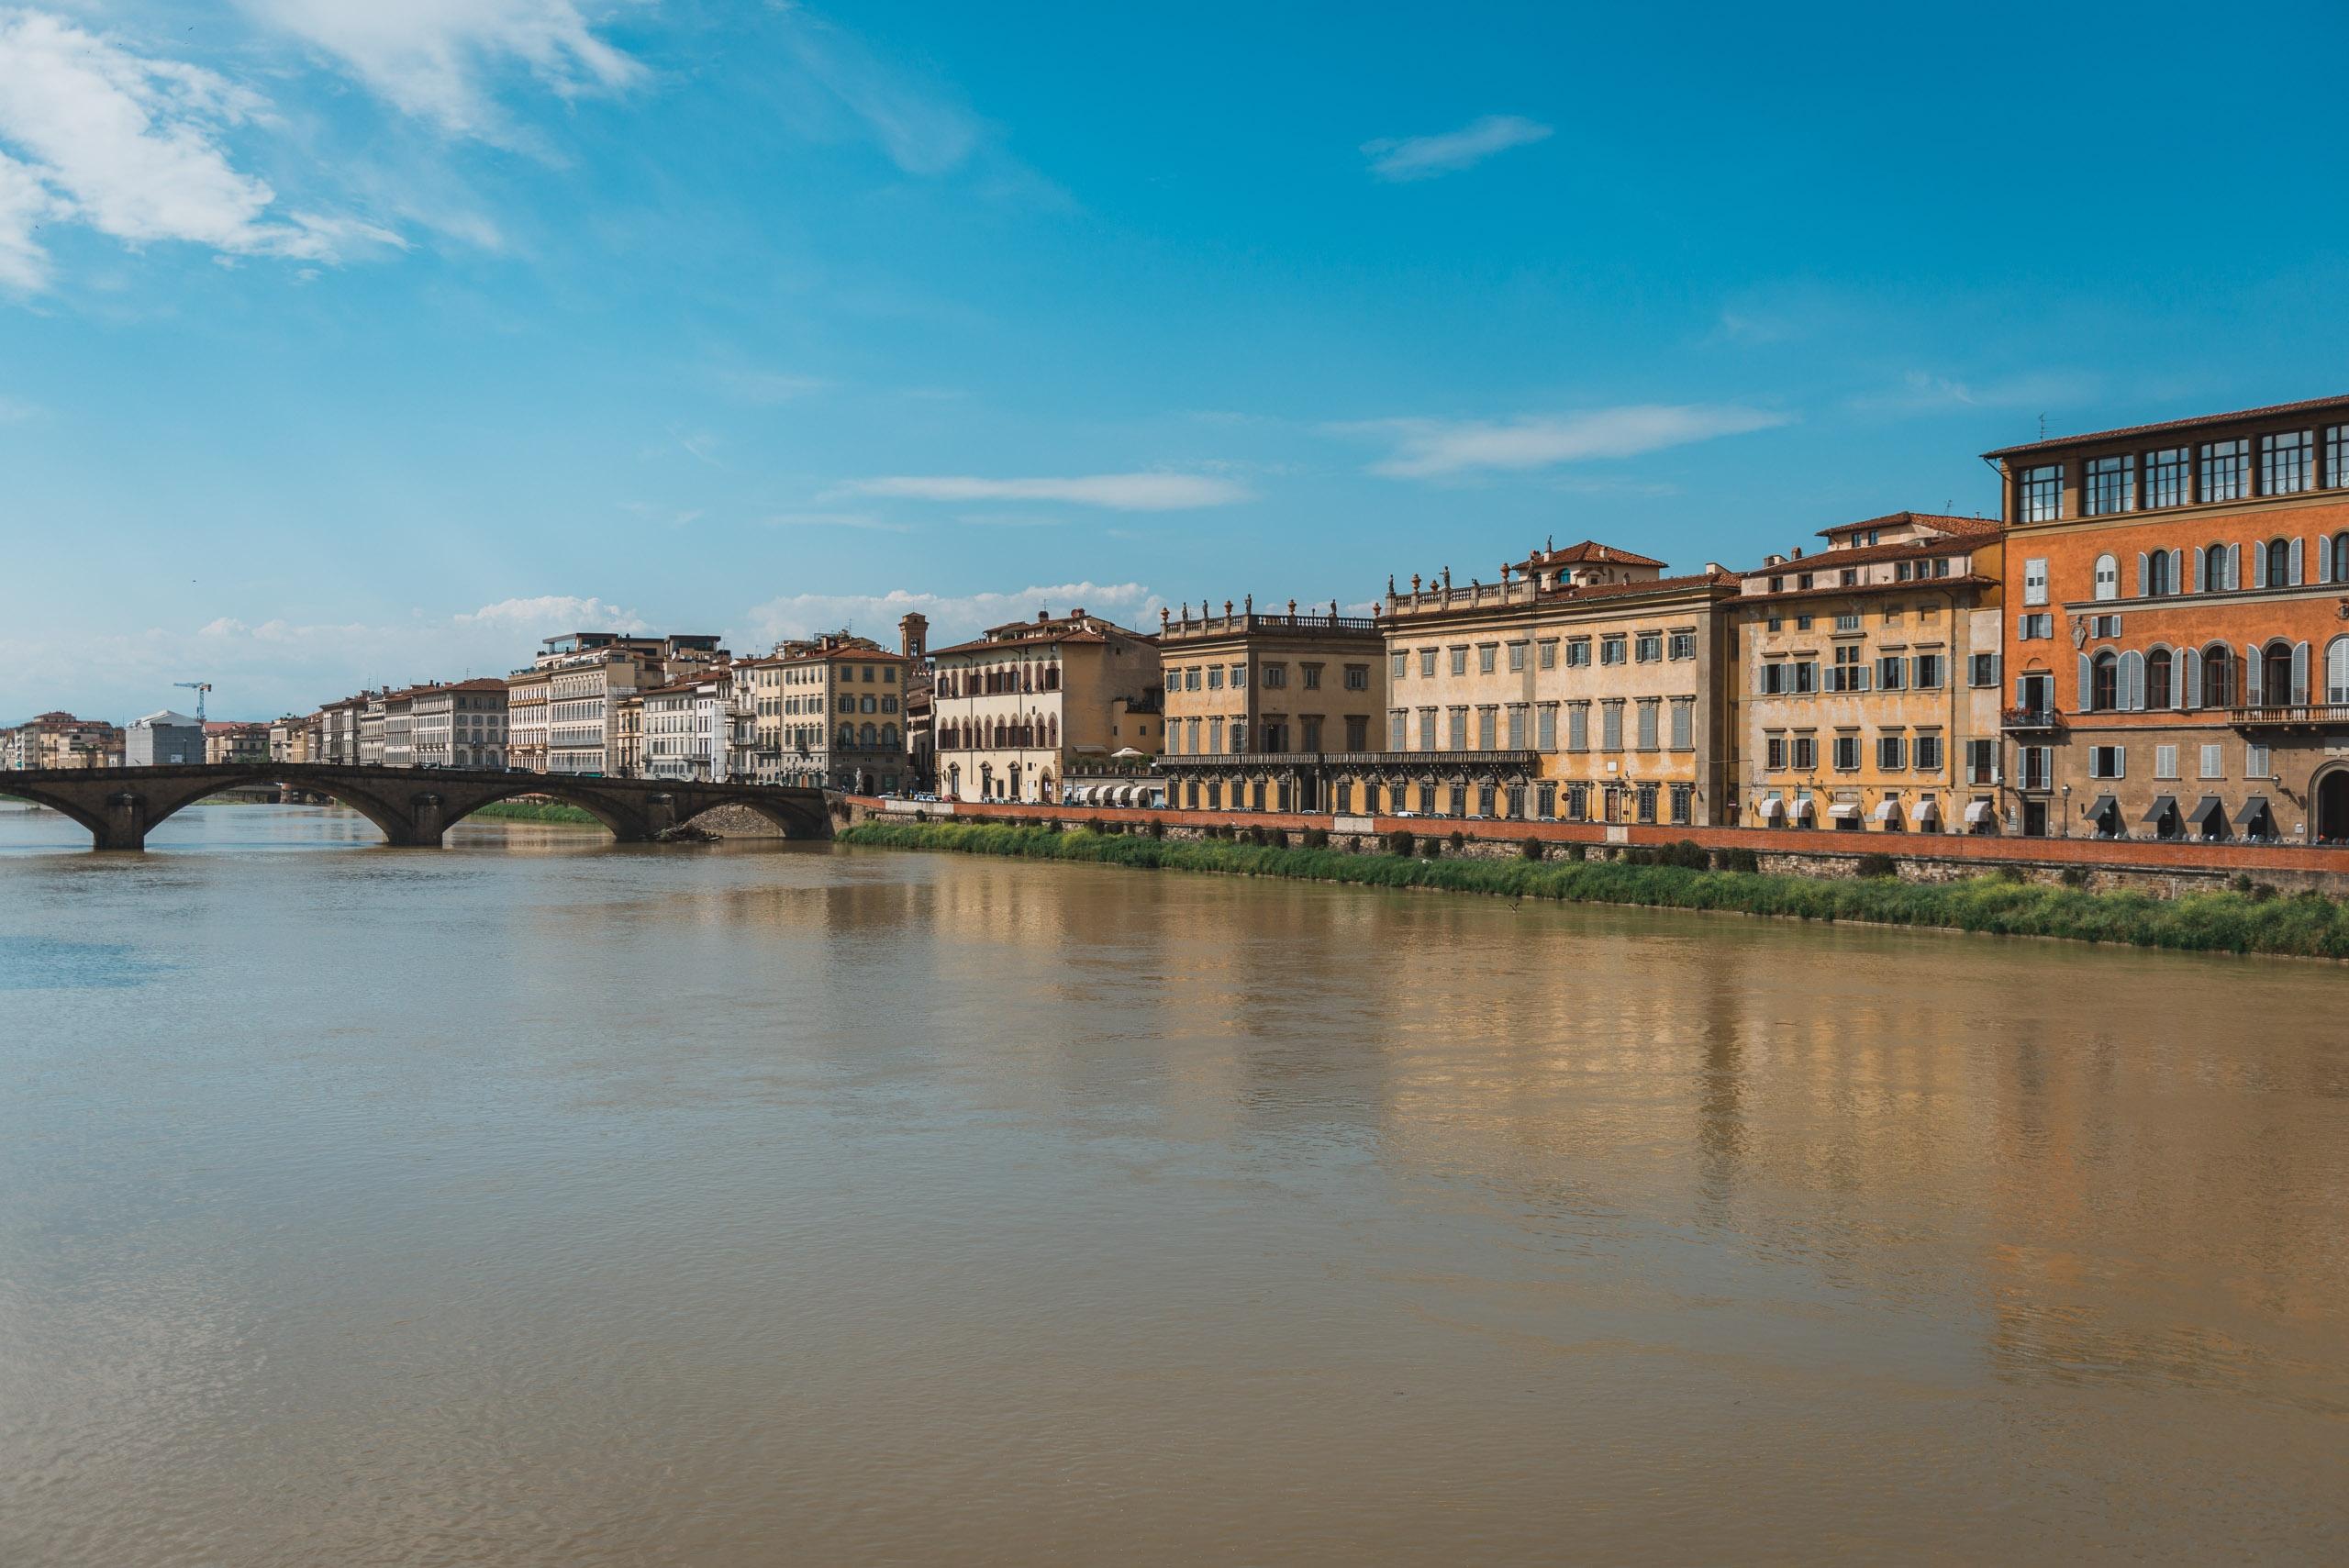 The Arno River 2